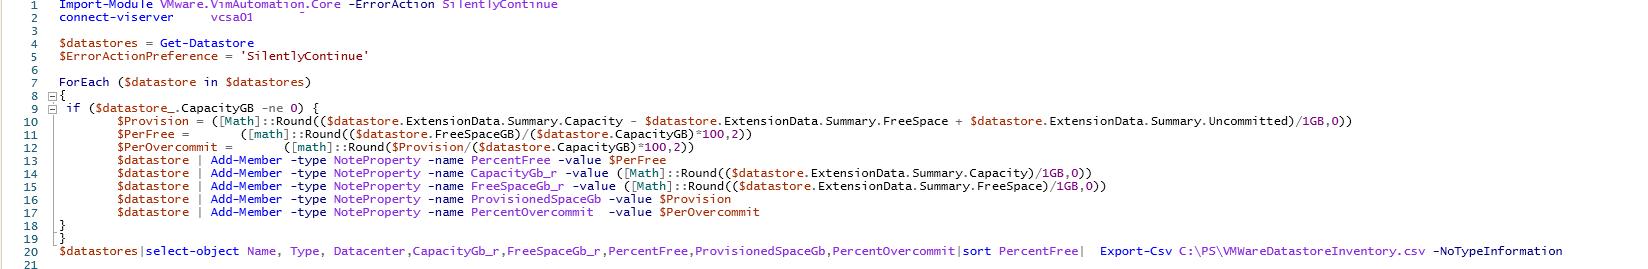 powershell скрипт для мониторинга места на vmware хранилищах в vSphere